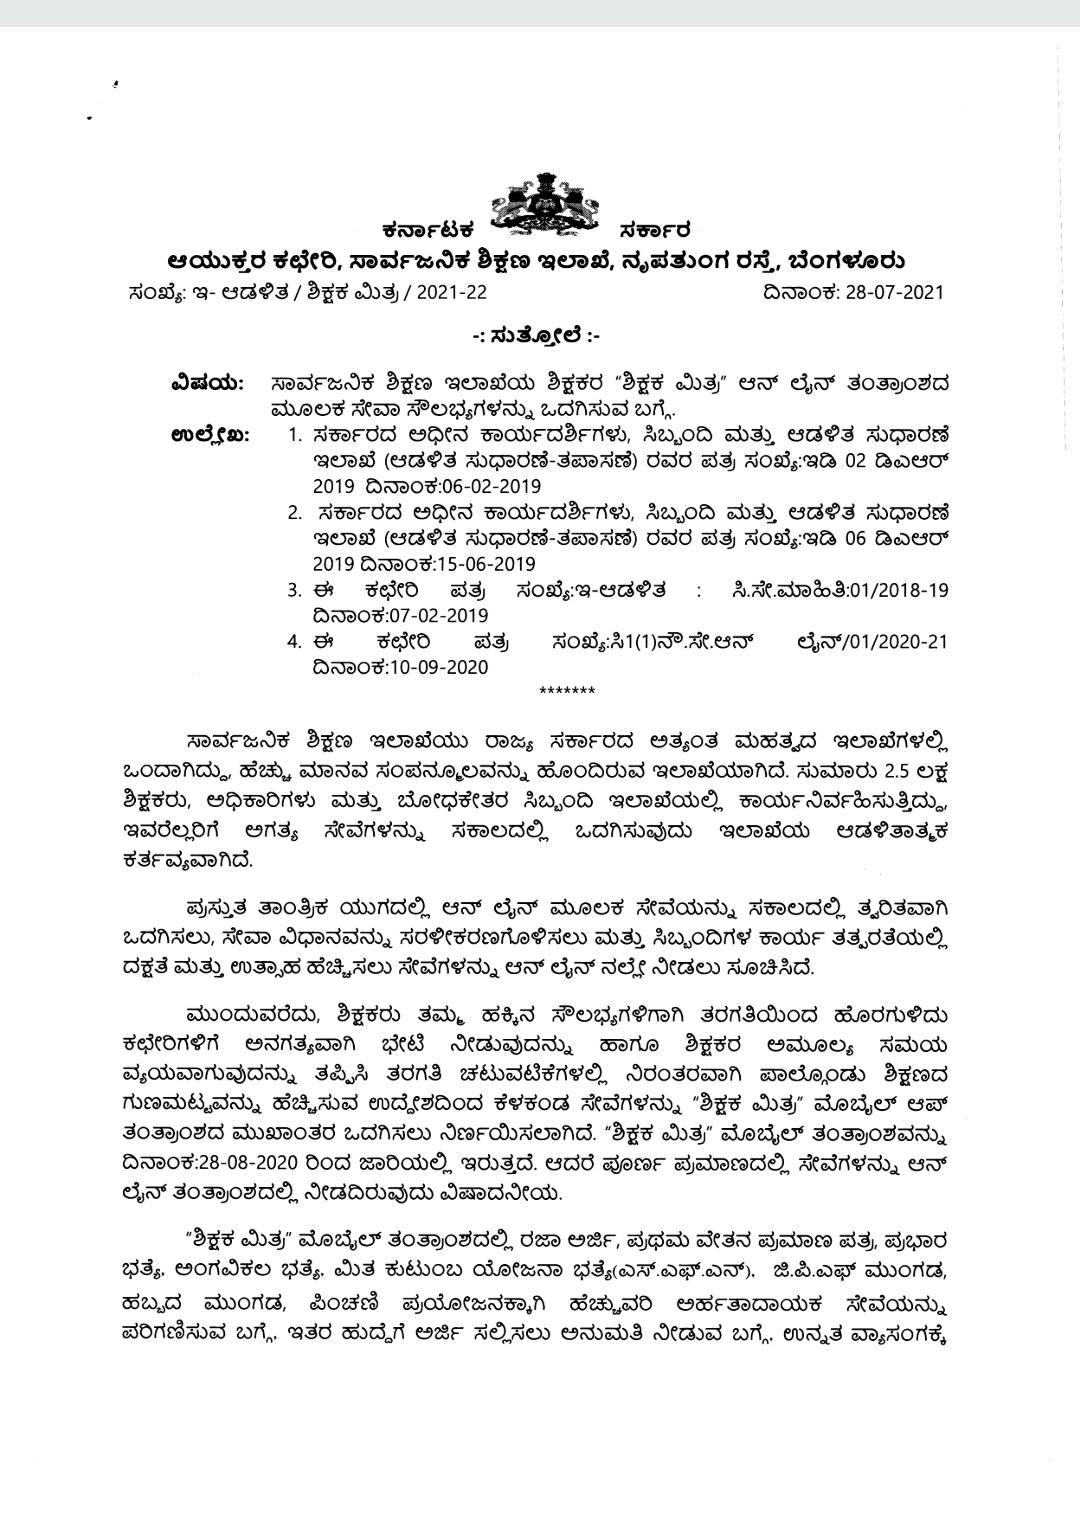 """Teacher Mitra"" of Teachers of Public Education Department on providing service facilities through online technology."